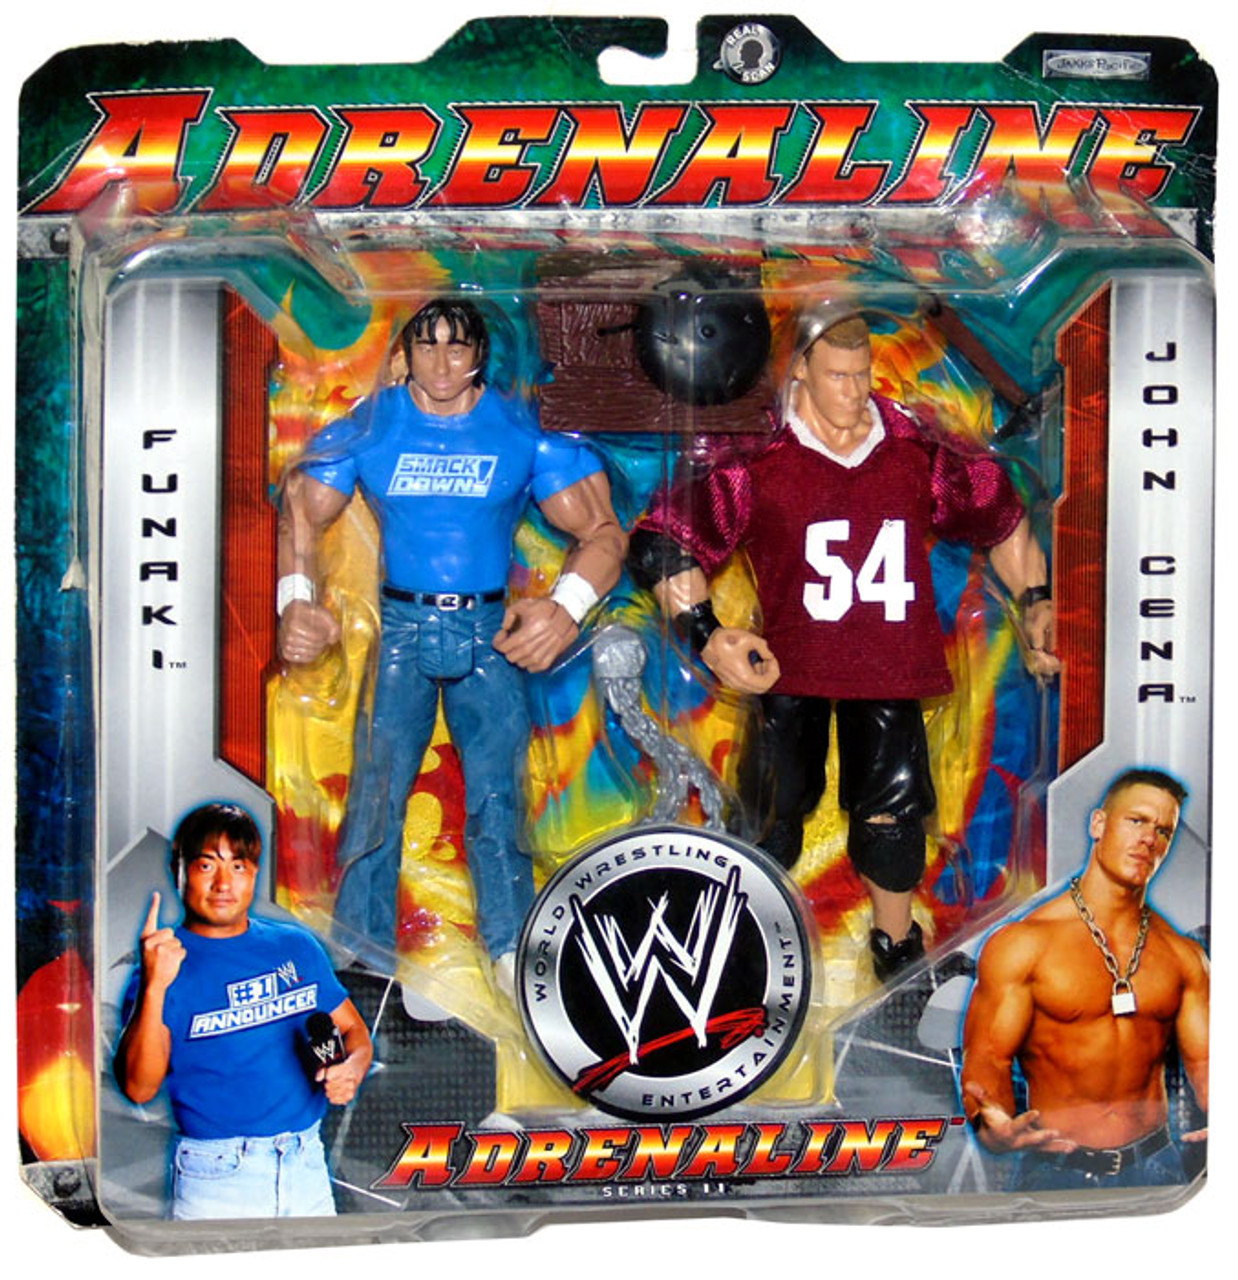 WWE Wrestling Adrenaline Series 11 John Cena & Funaki Action Figure 2-Pack